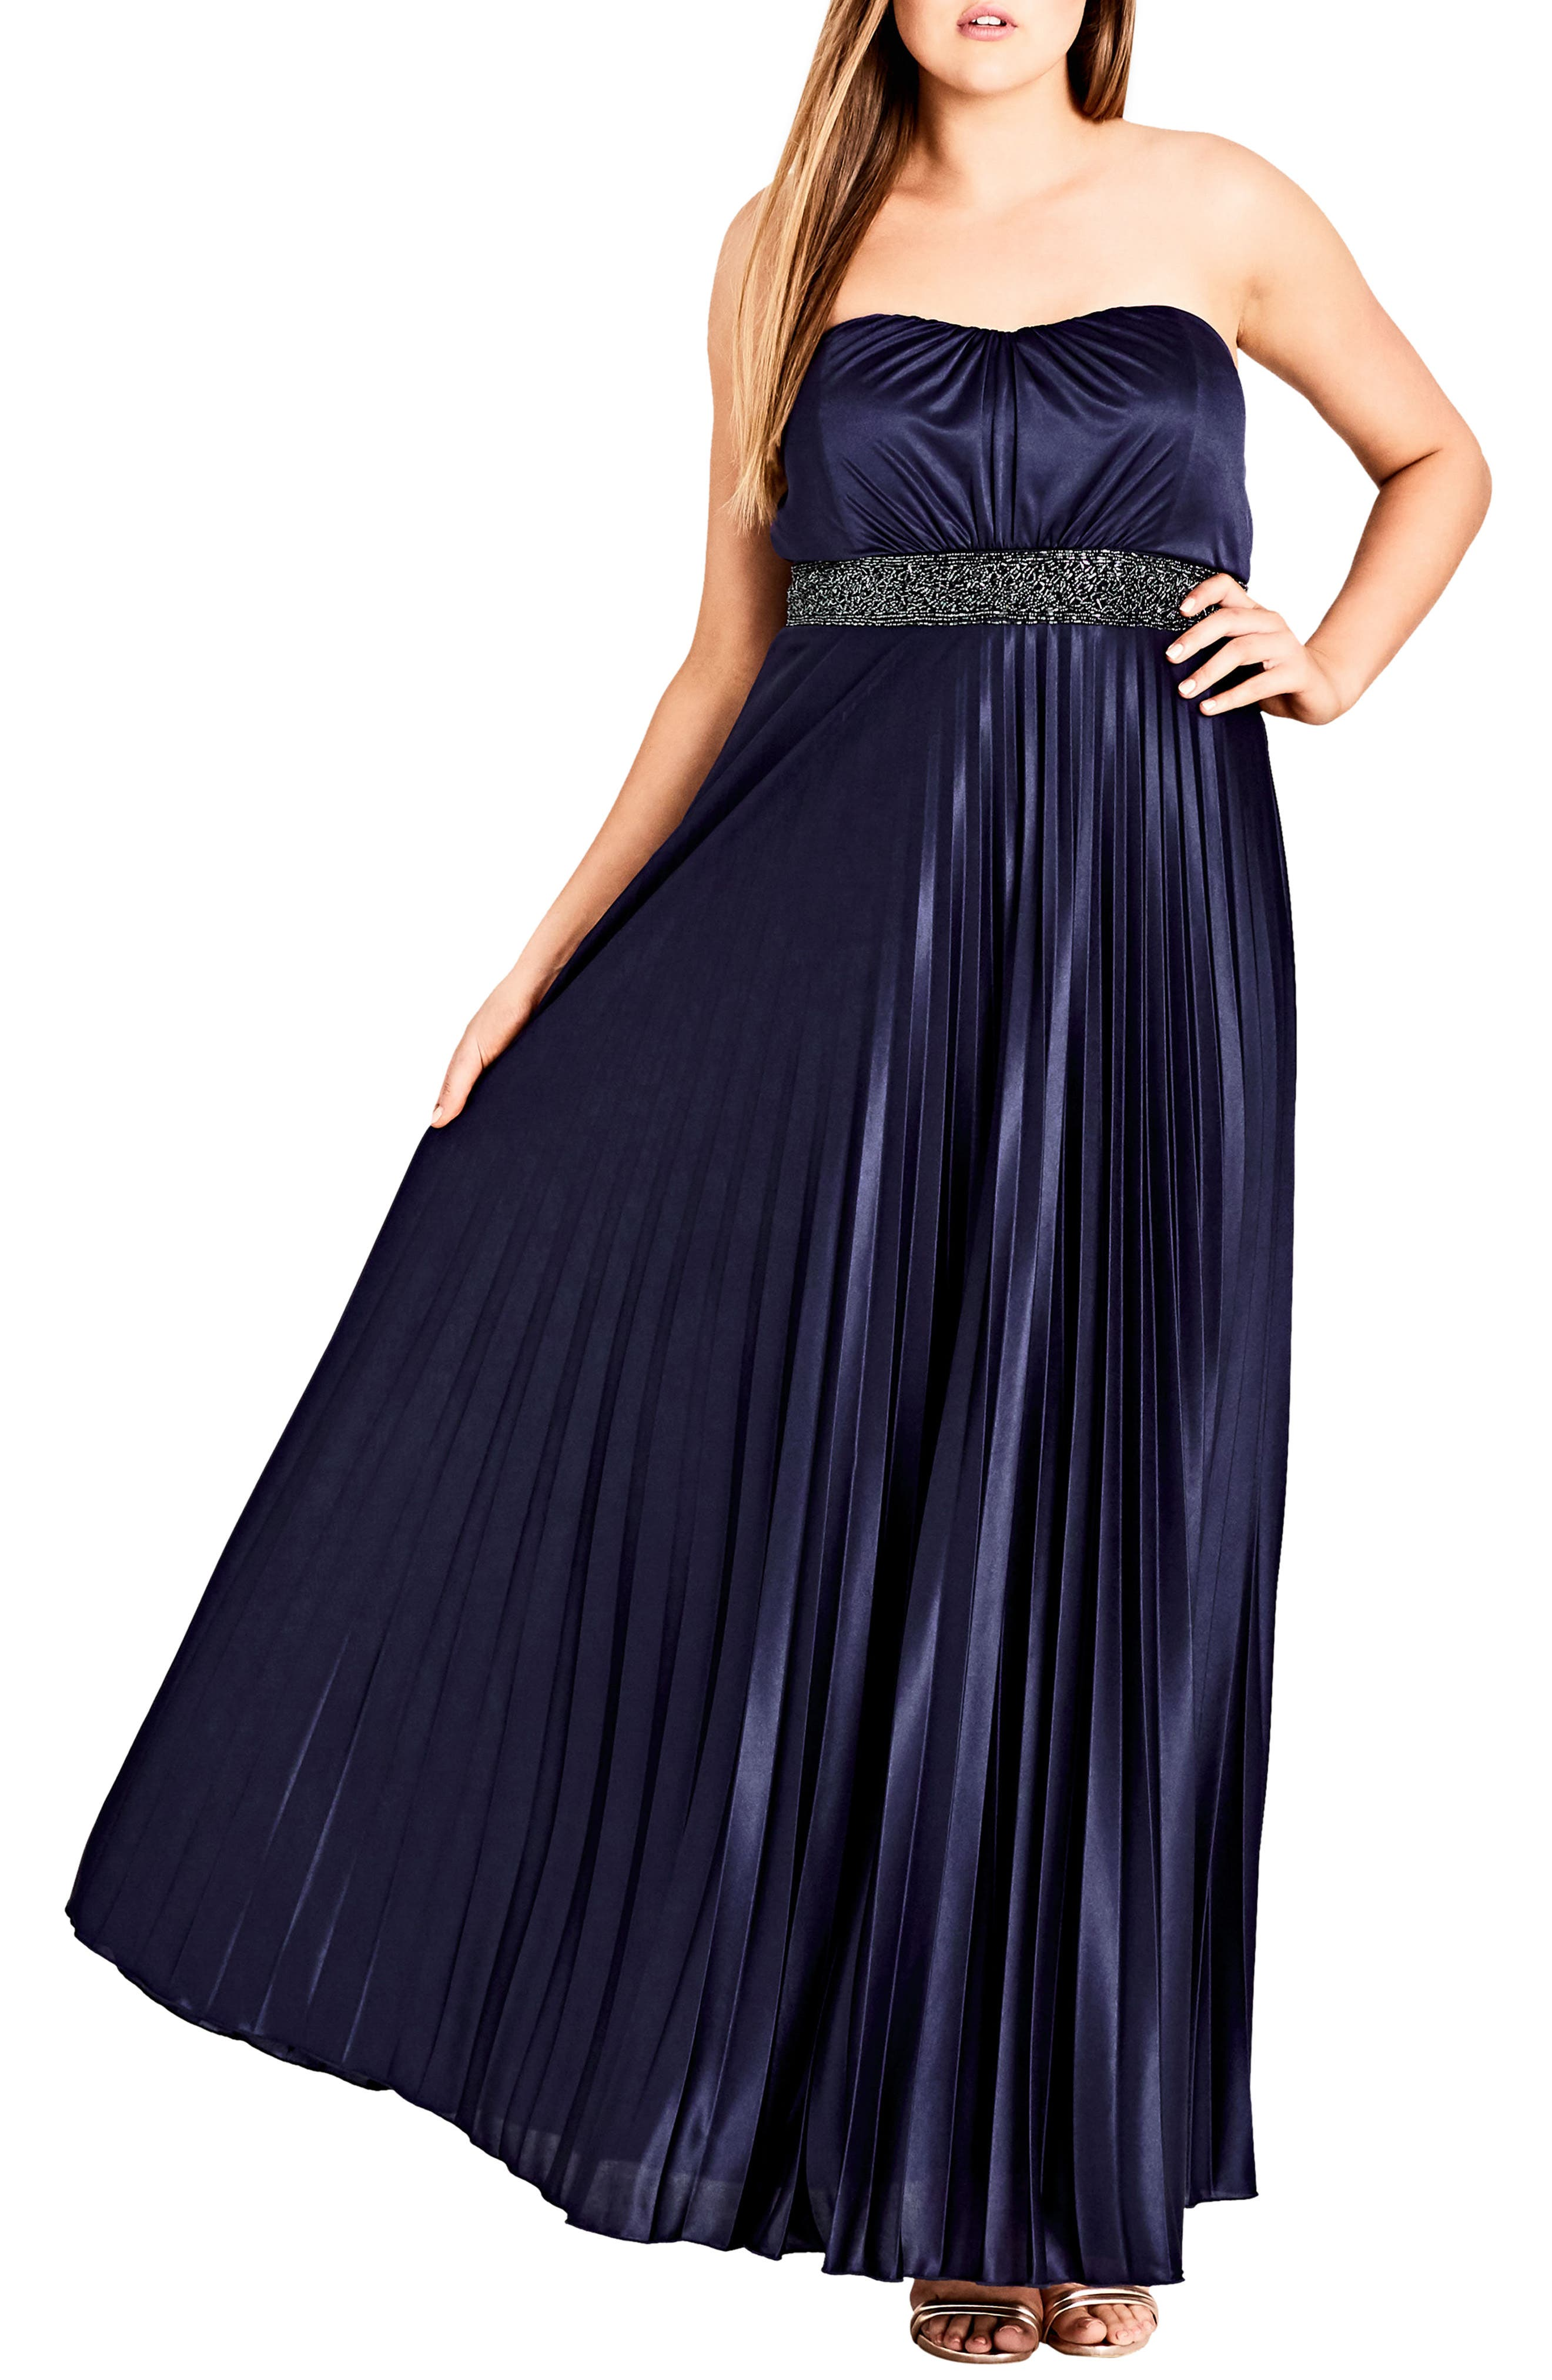 Helena Embellished Strapless Maxi Dress,                         Main,                         color, NAVY